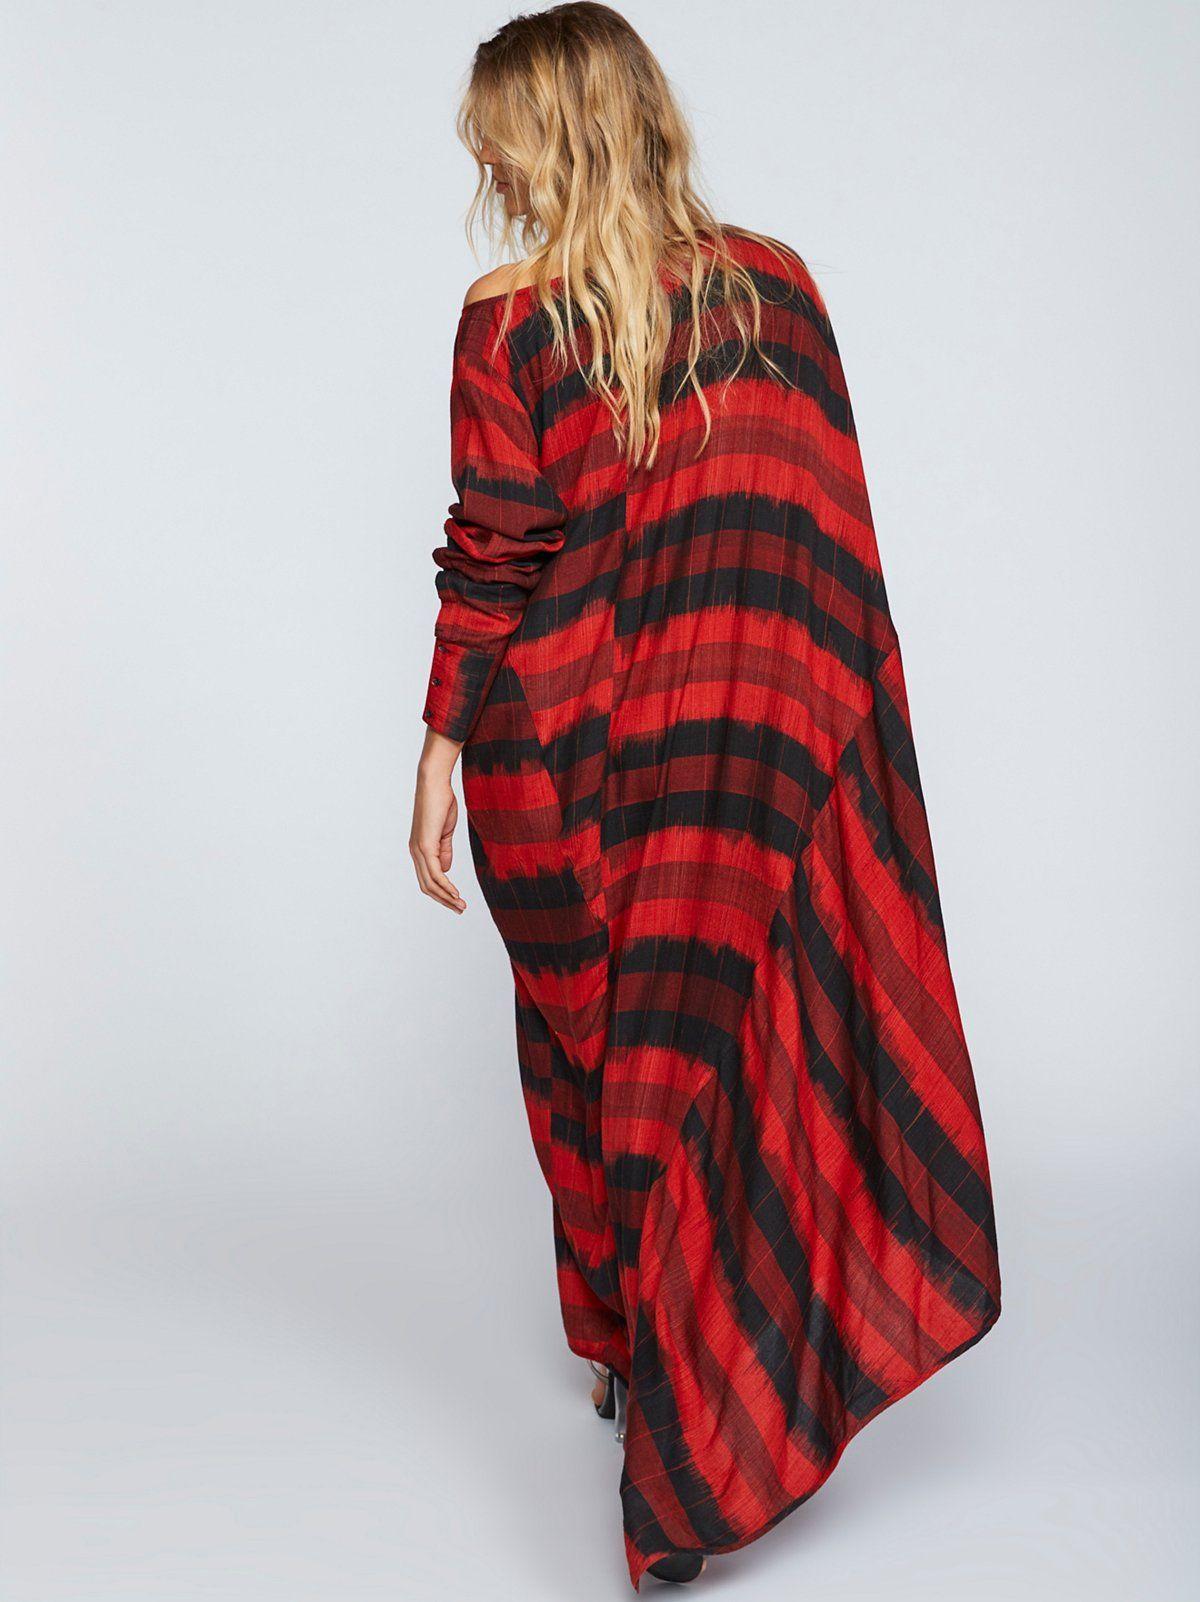 Santo ikat dress ultra oversized printed dress with an